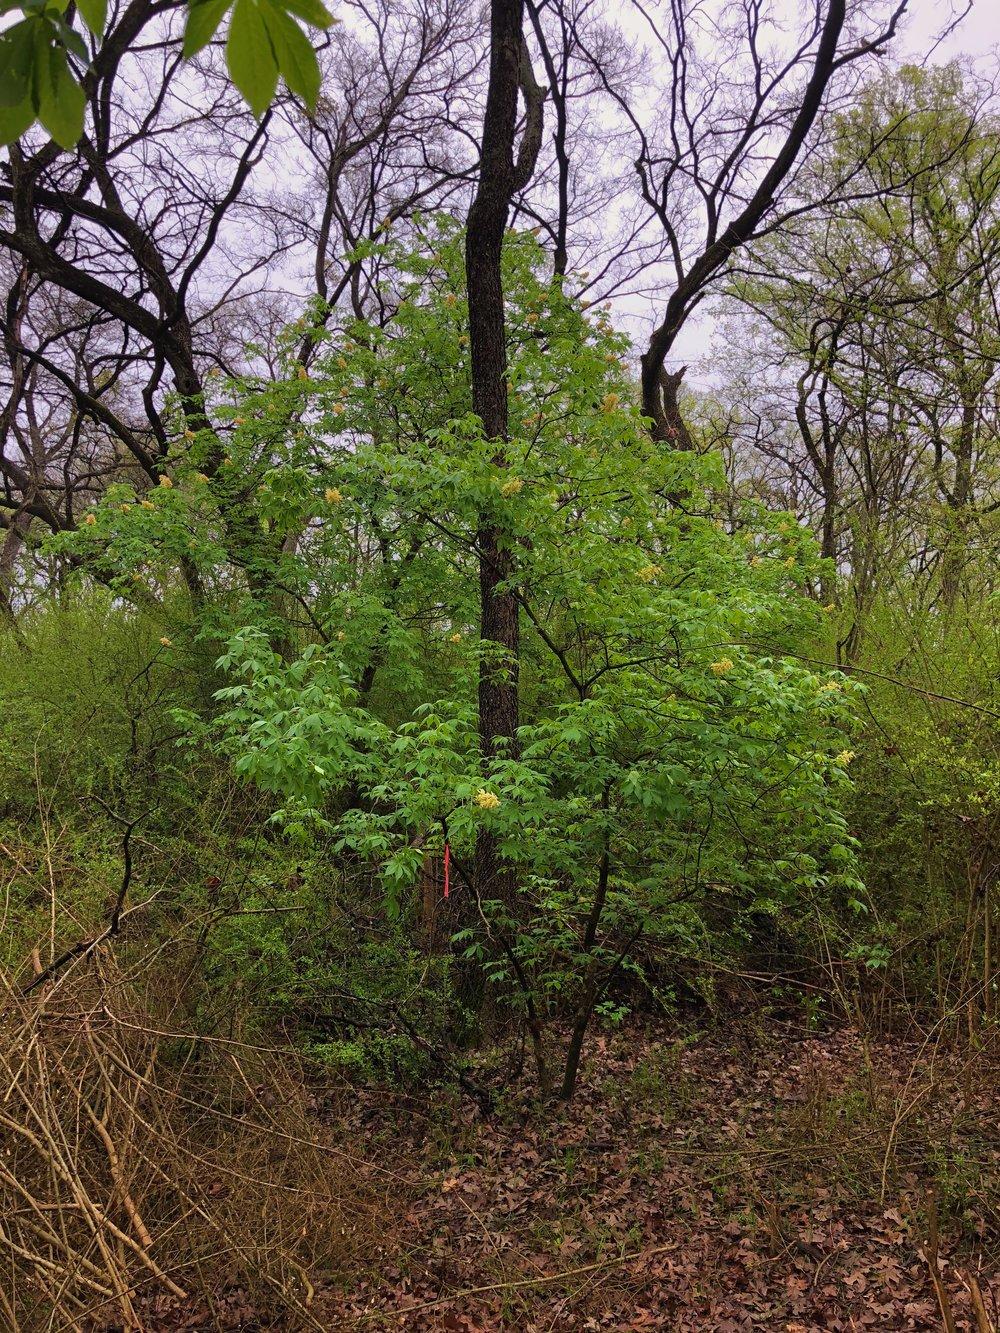 Aesculus glabra var. arguta, Texas buckeye